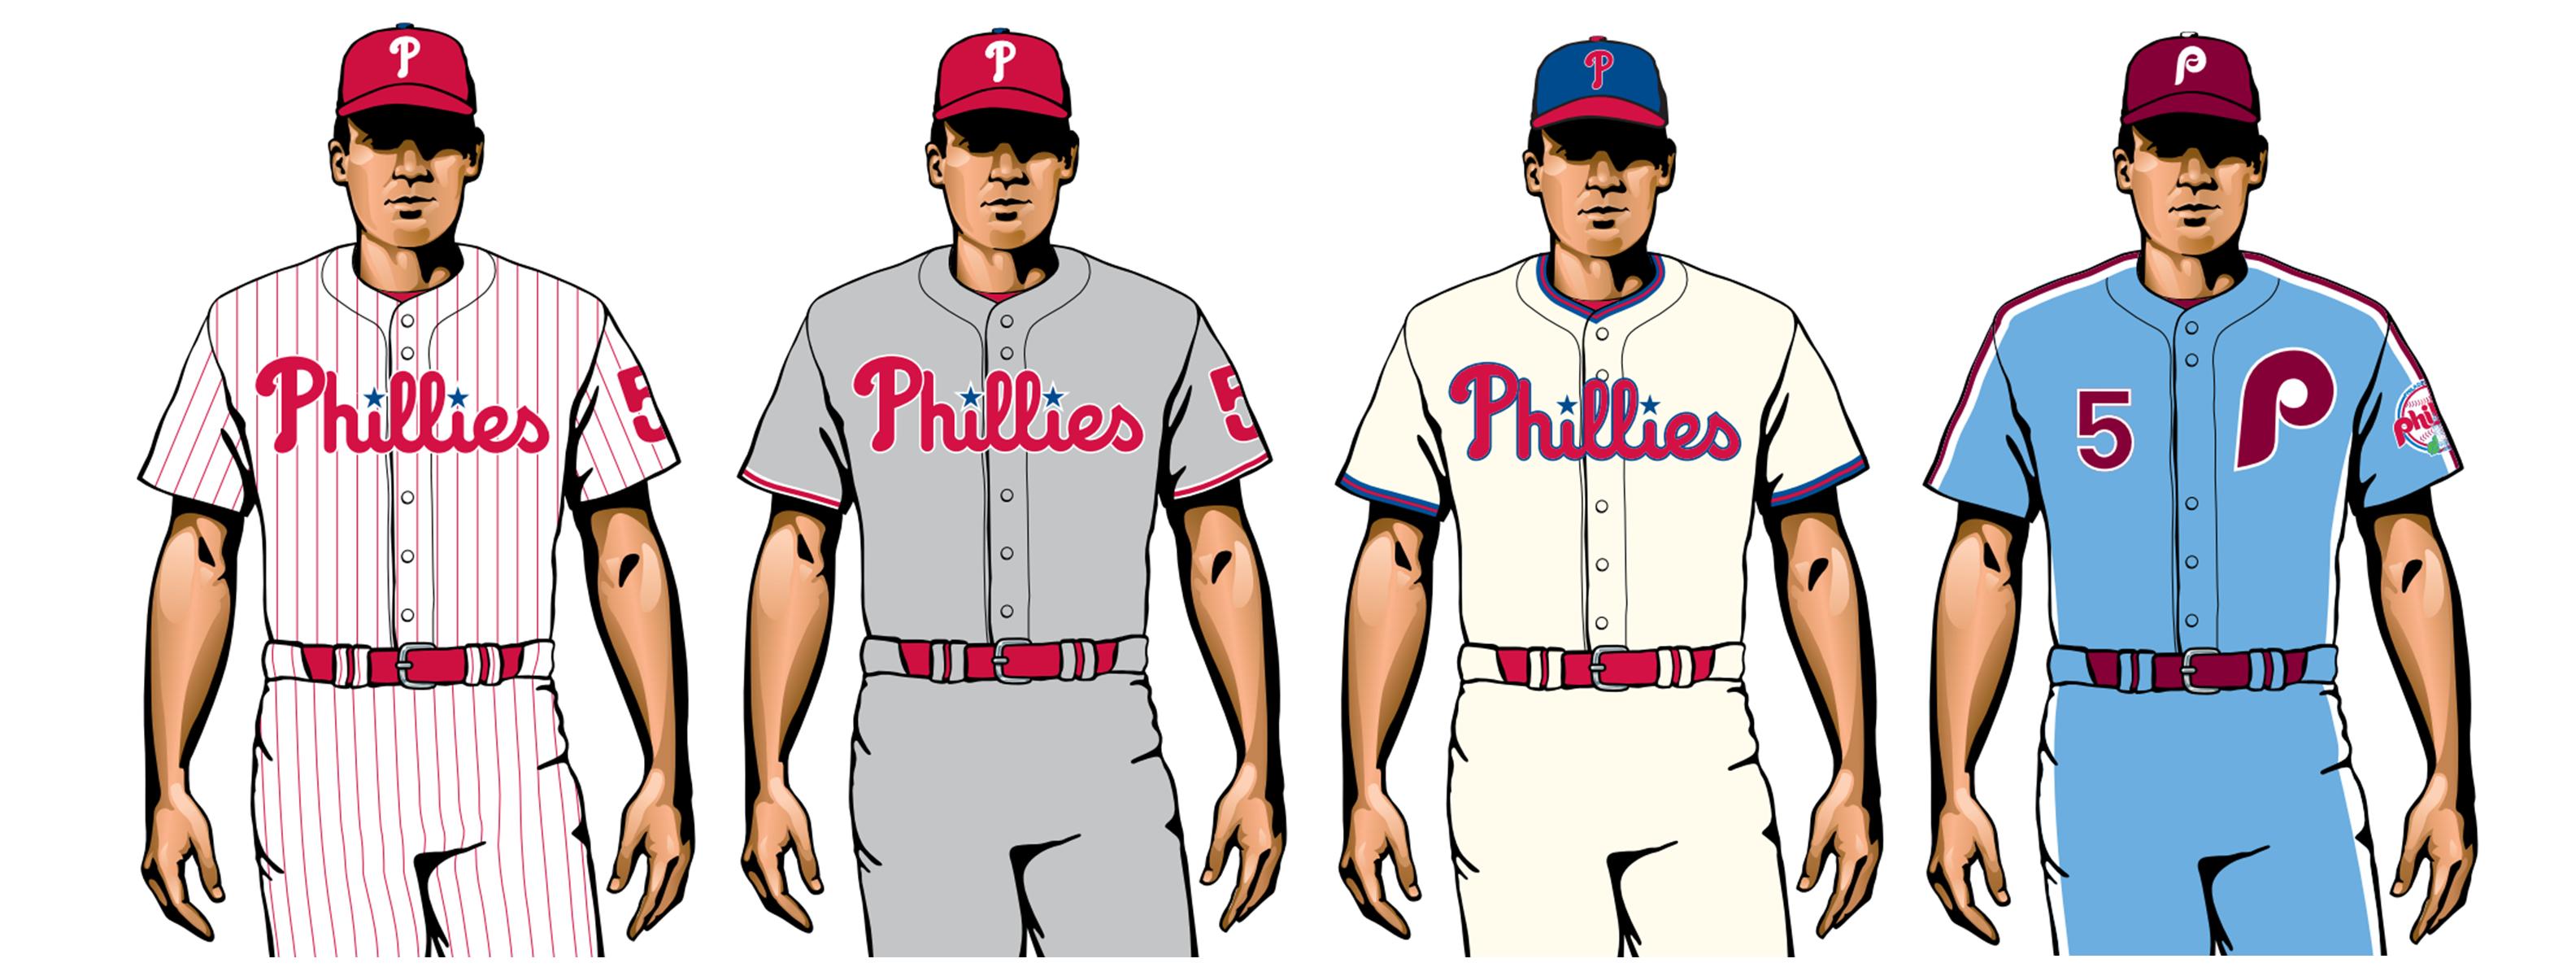 philadelphia phillies 2020 uniformes